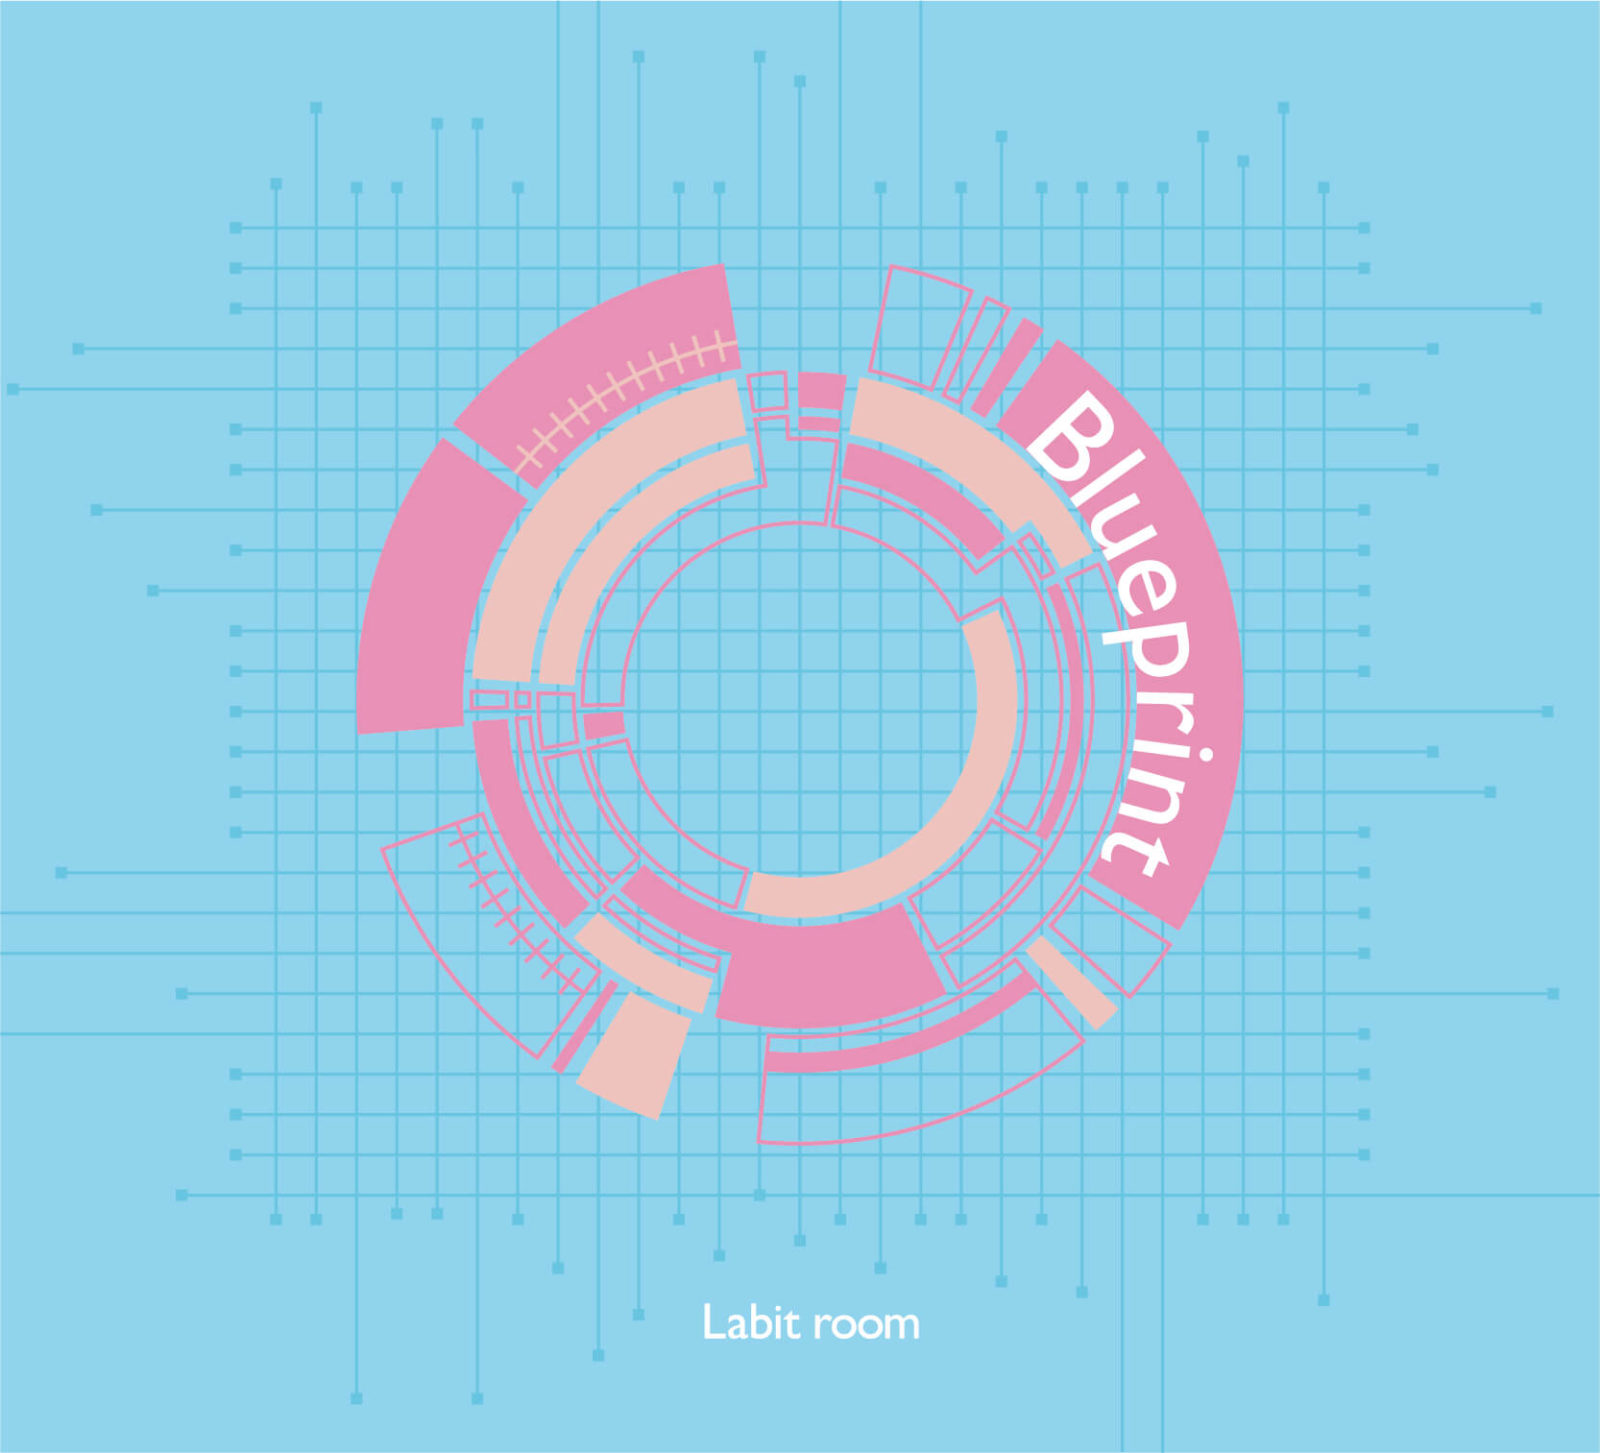 Labit room、3年ぶりにMini Albumをリリースサムネイル画像